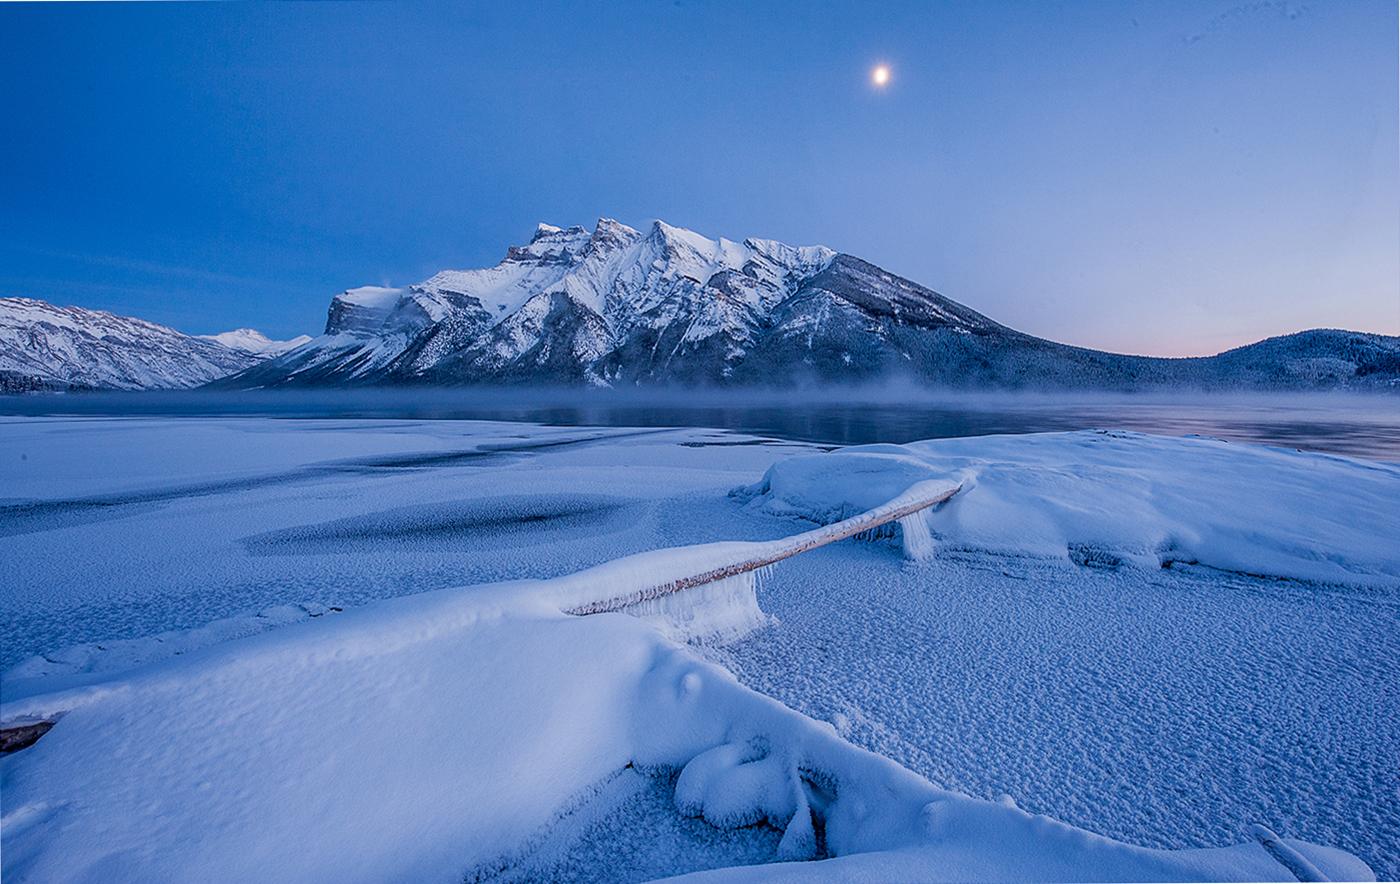 4N_G_minnewanka lake_CR